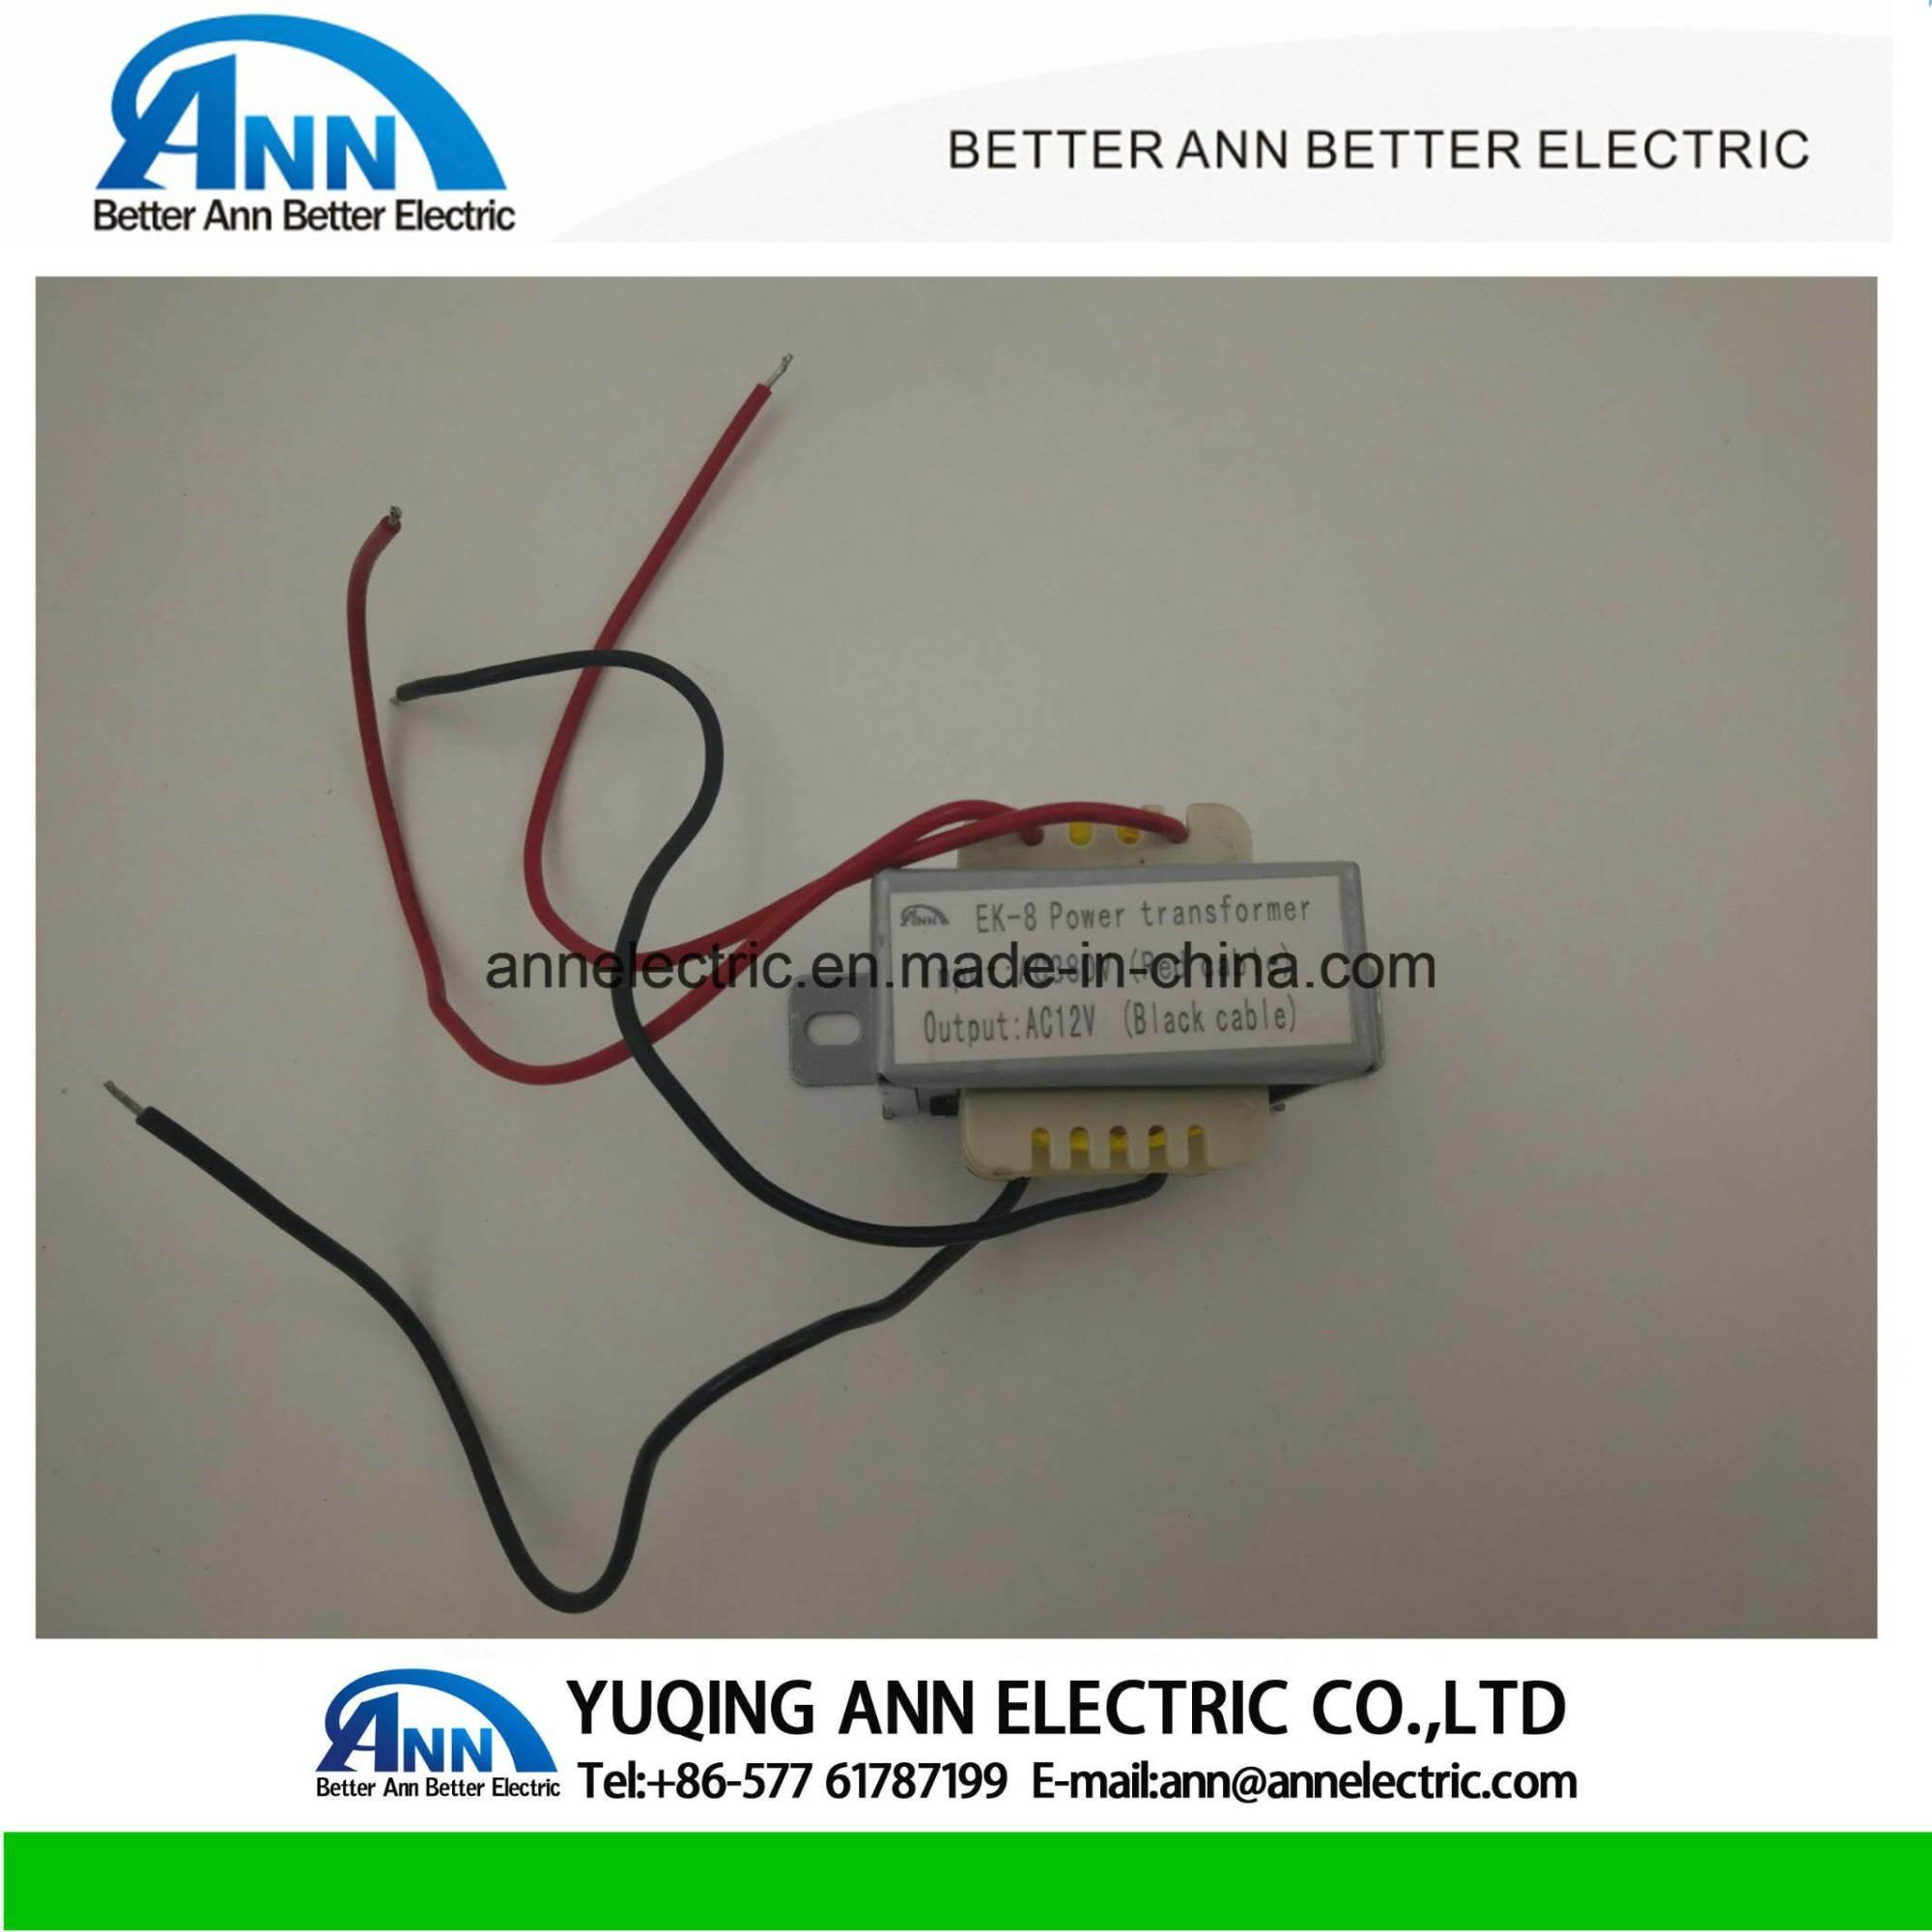 hight resolution of china ei transformer single phase power 230v 240v 120v 100v with ul pse ccc ce cb approval china power transformers transformers